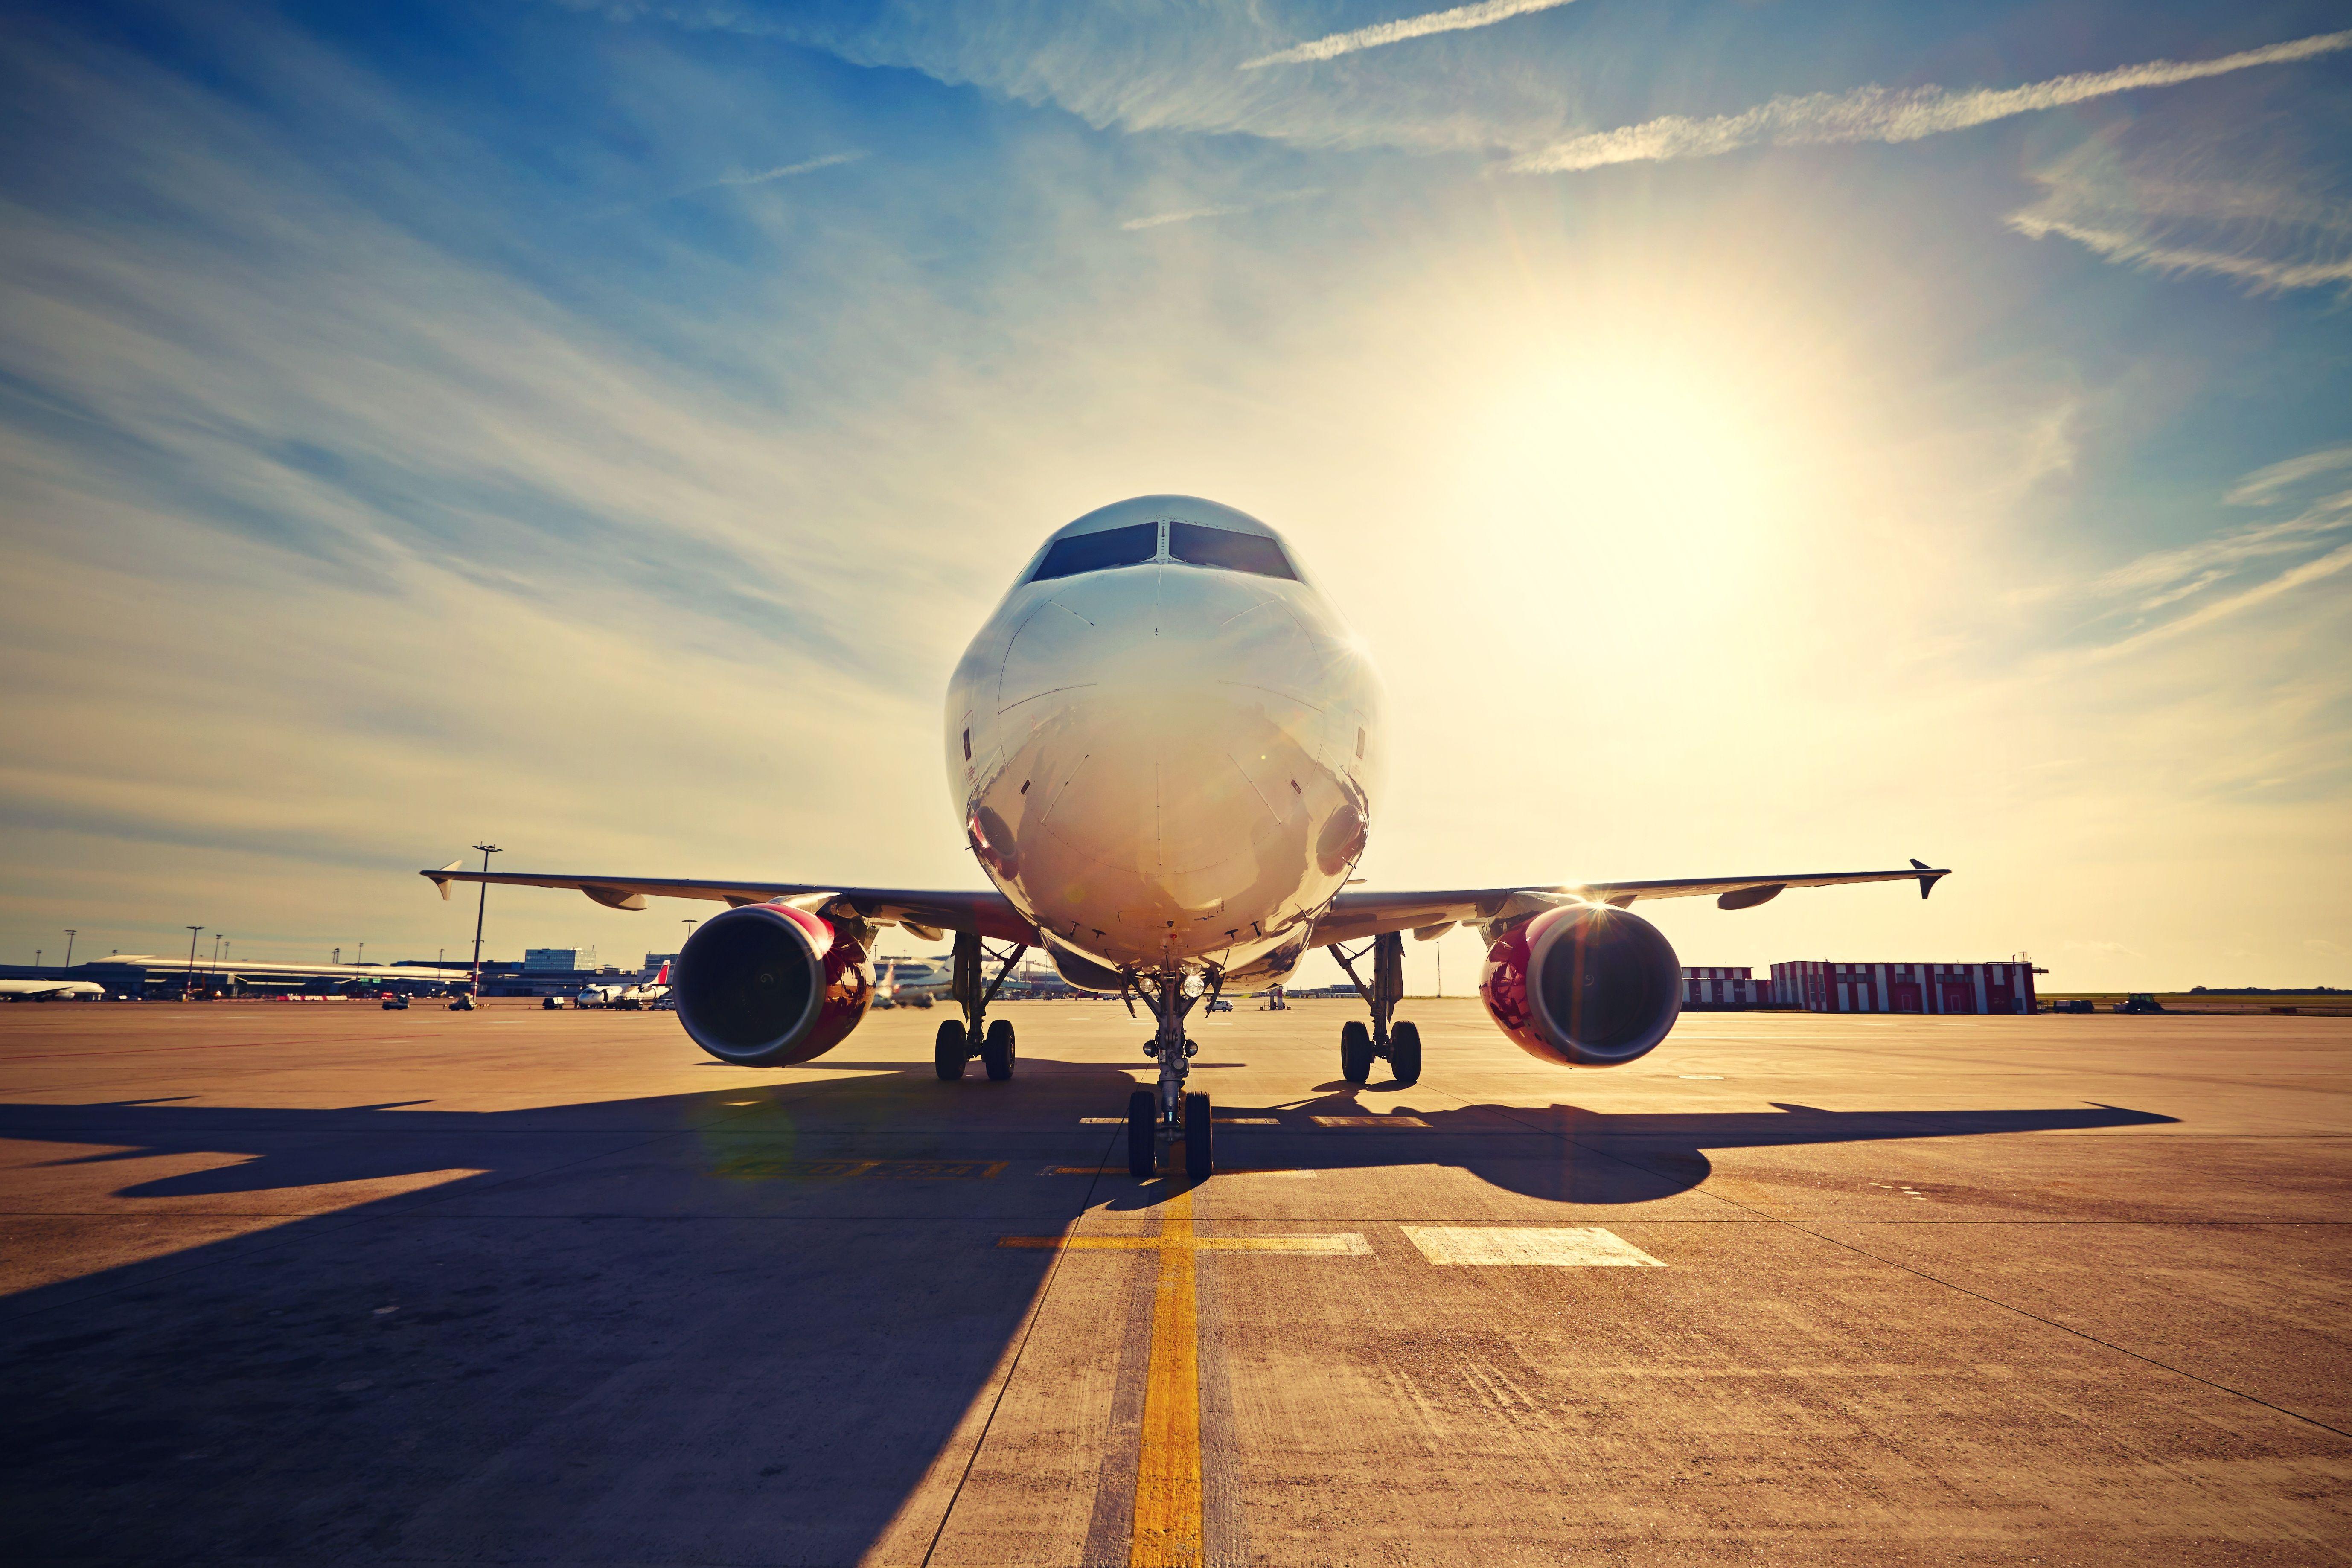 Siesta Key Airports Fear of flying, Aircraft, Airfare